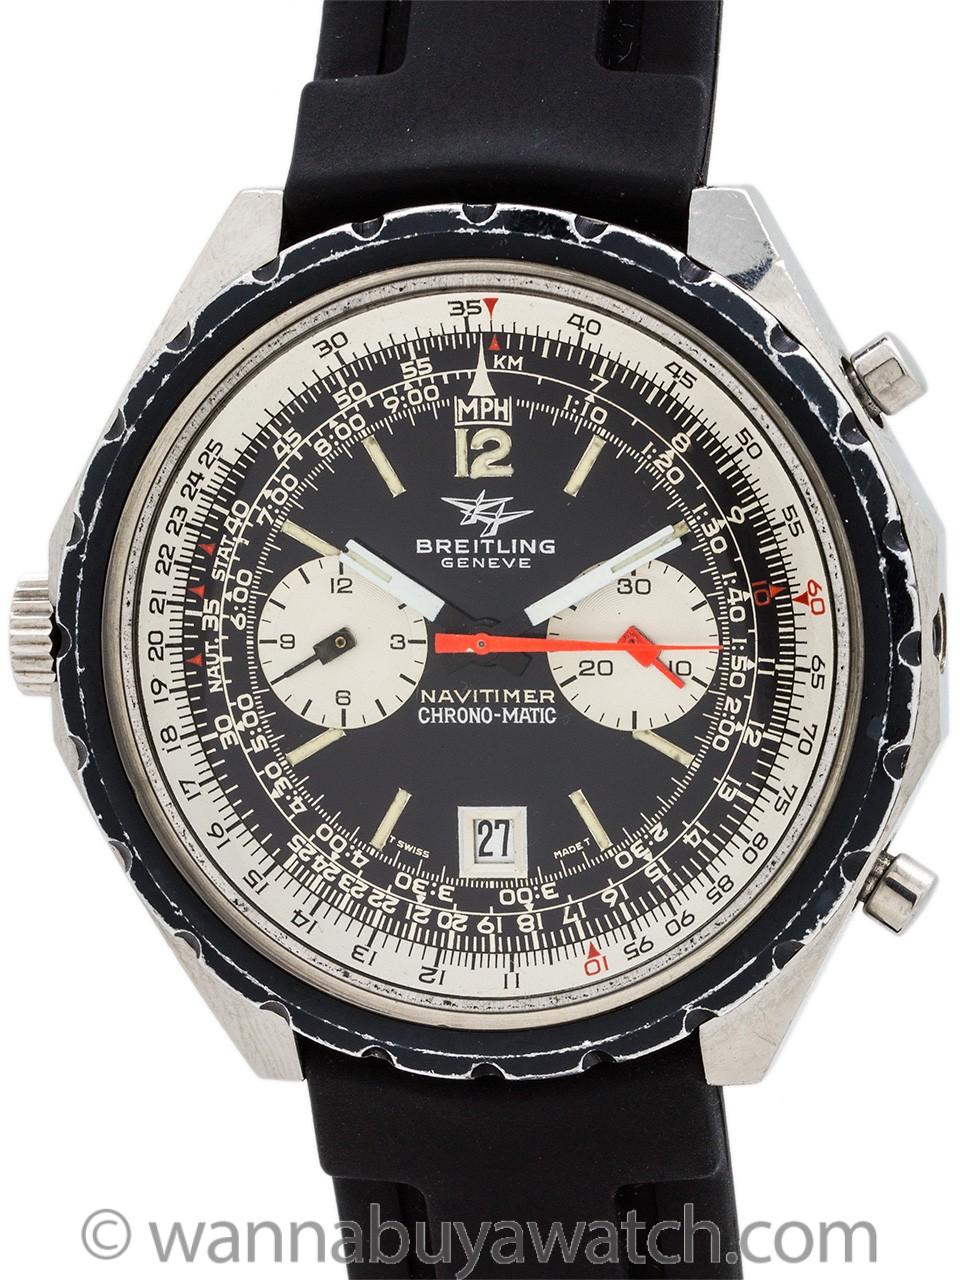 Breitling ref 1806 Navitimer Chronomatic circa 1970's